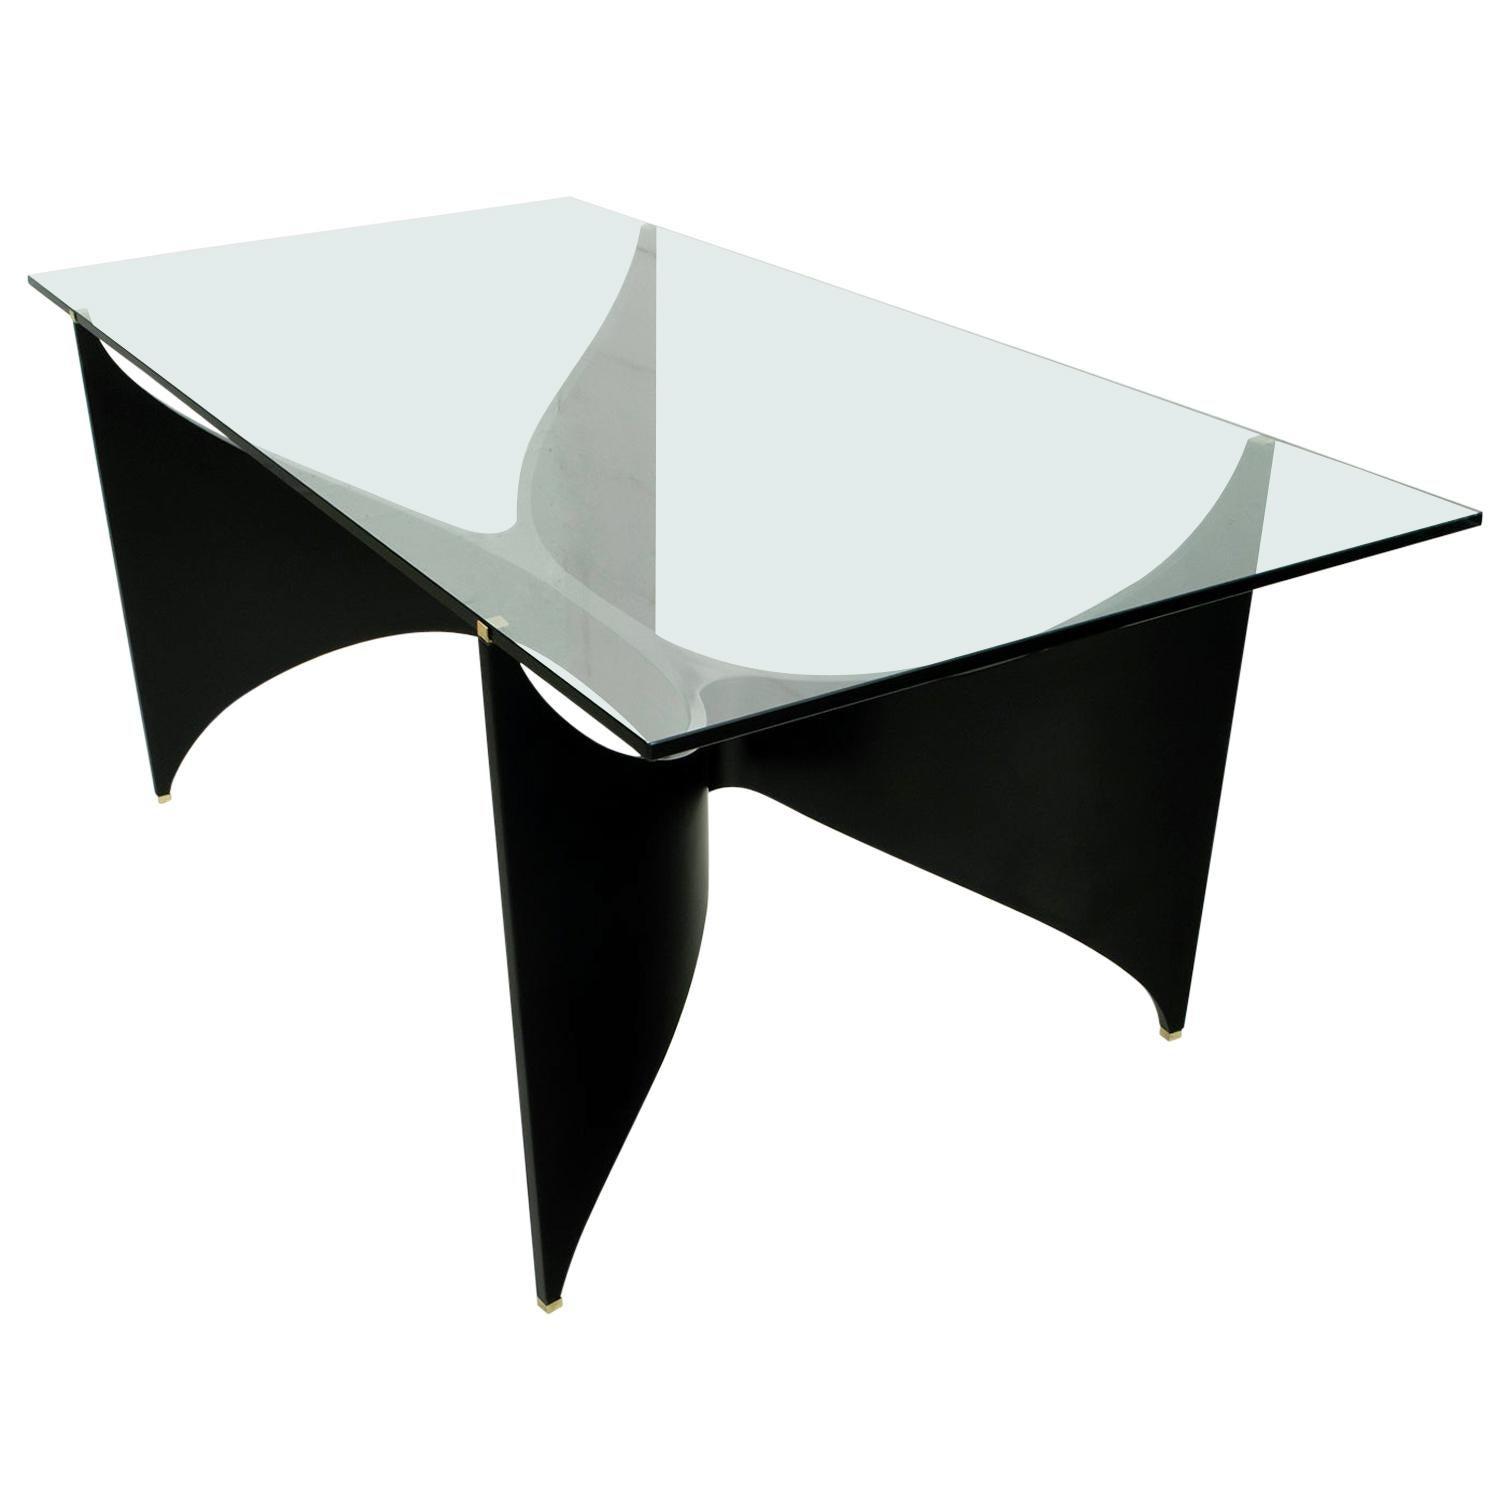 Massironi Manfredo Mid-Century Modern Italian Lacquered Dining Table, 1970s